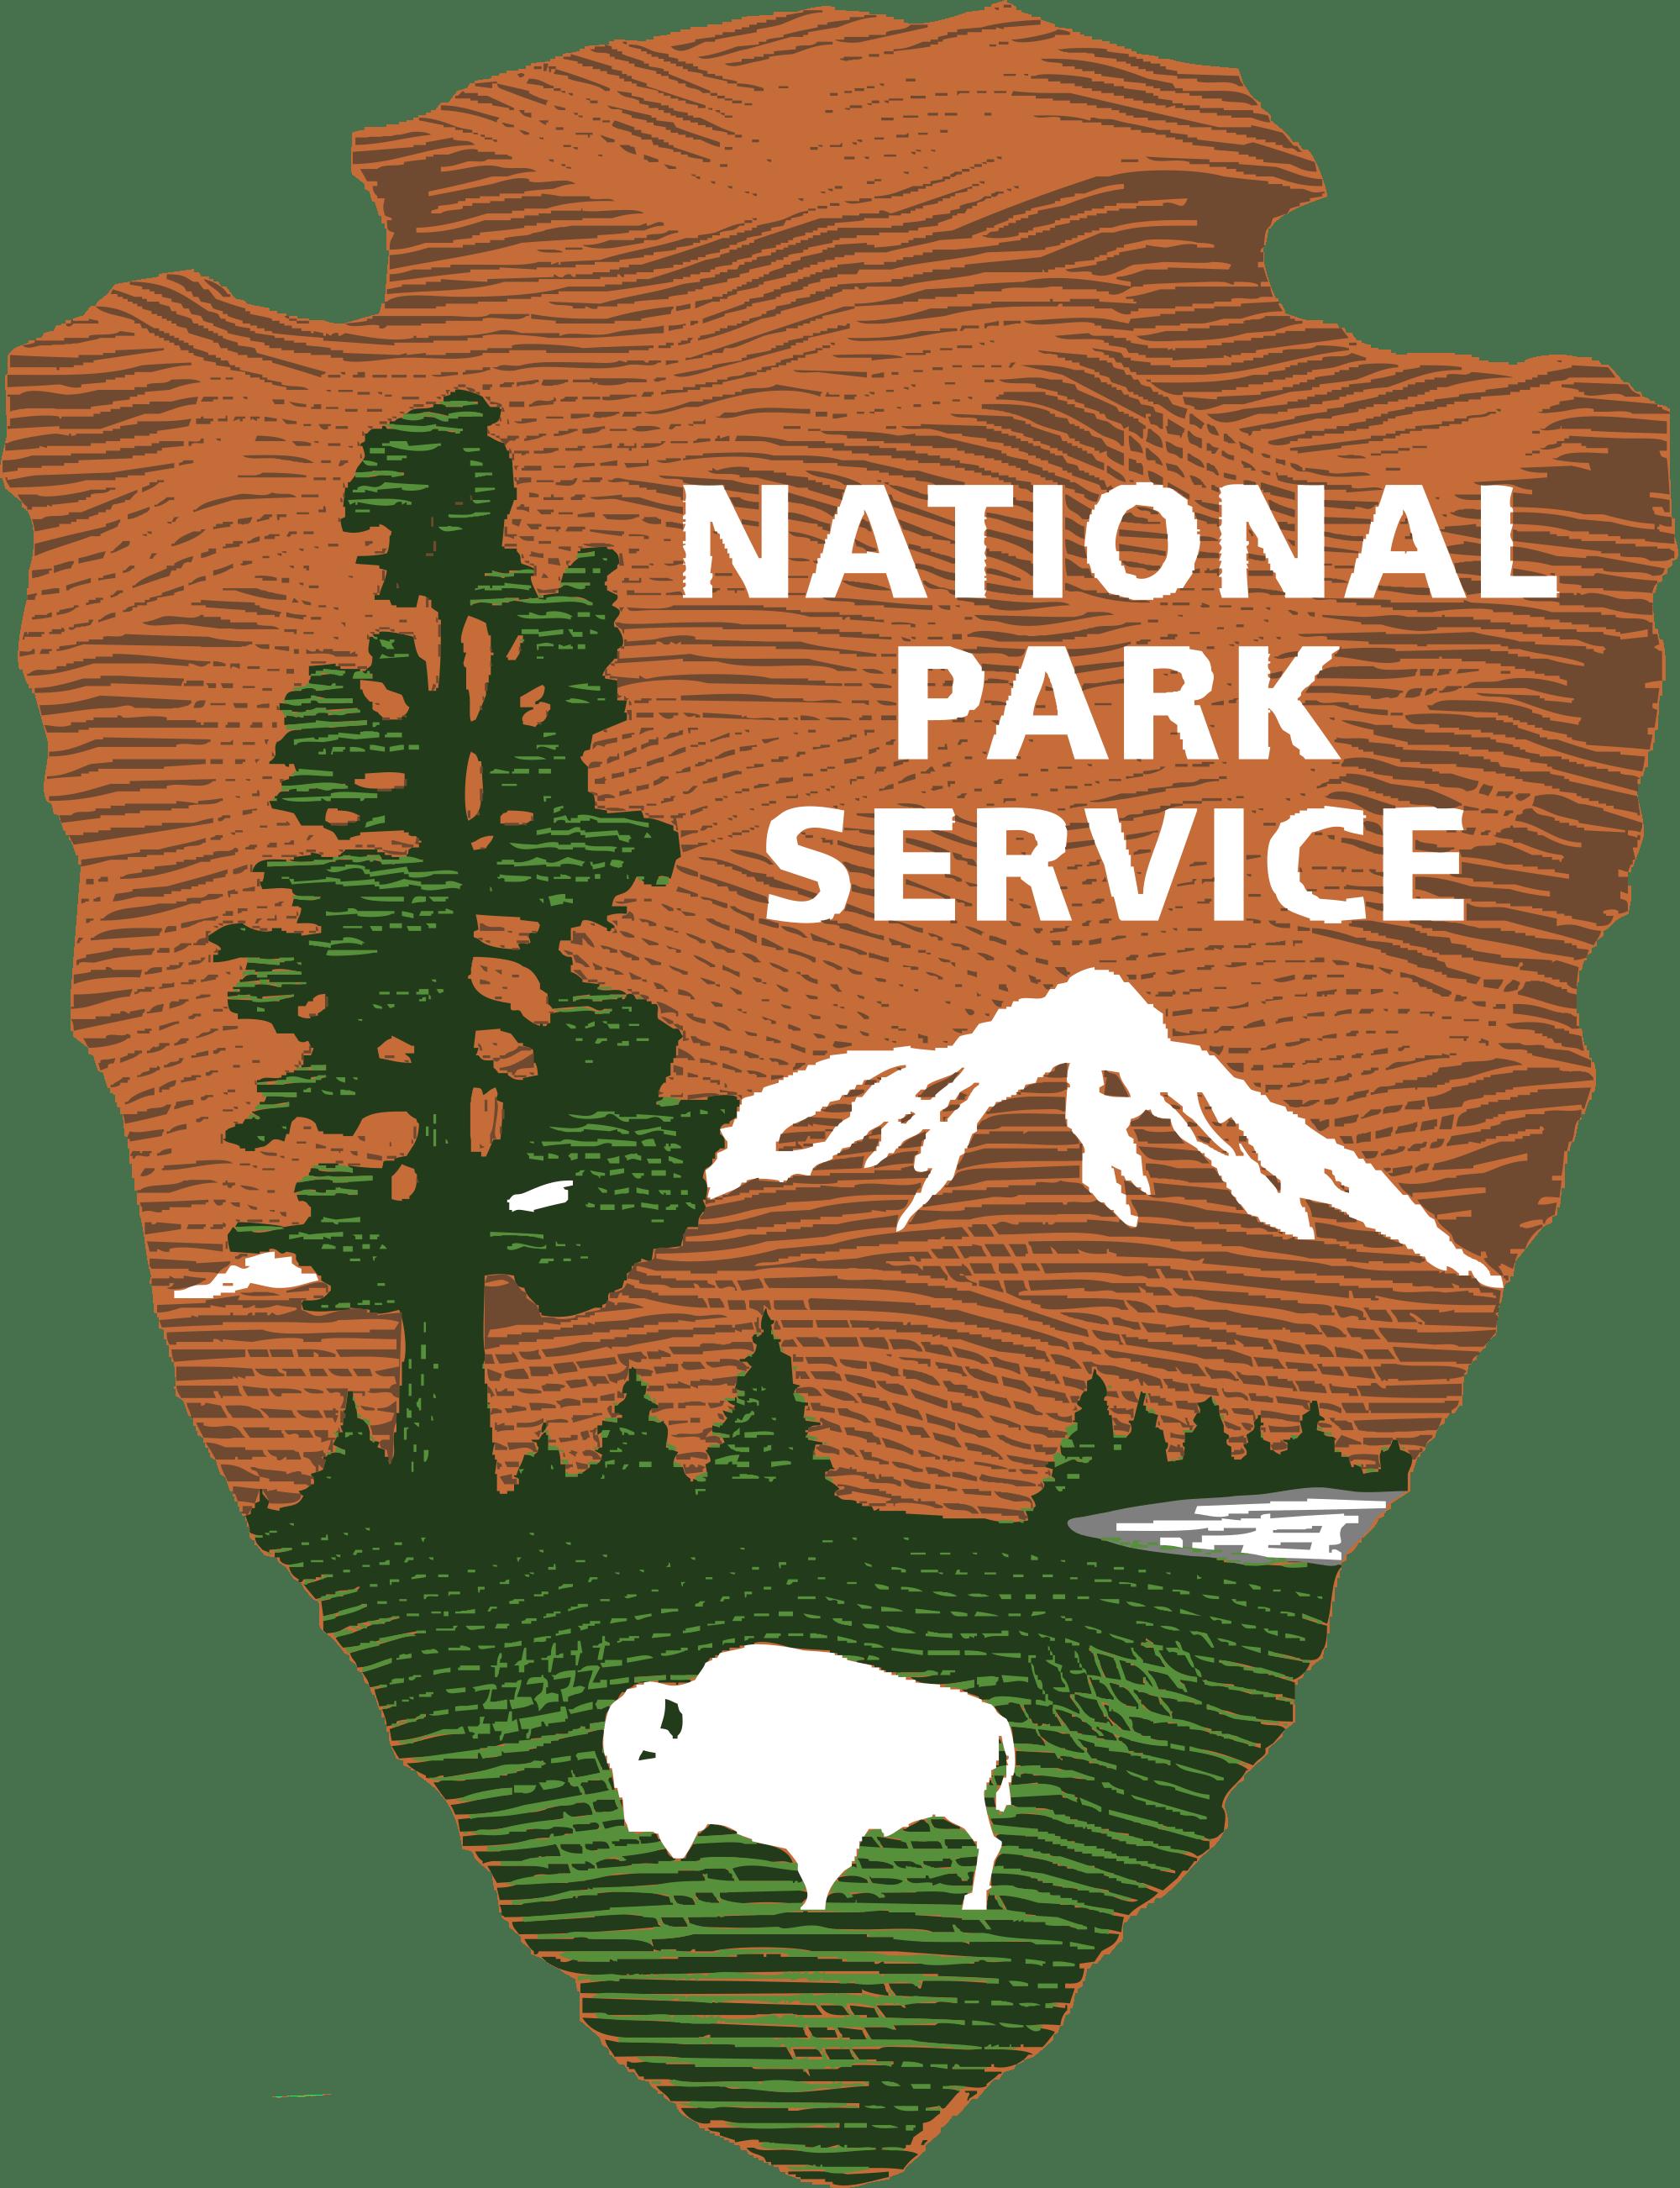 National Park Service transparent PNG.